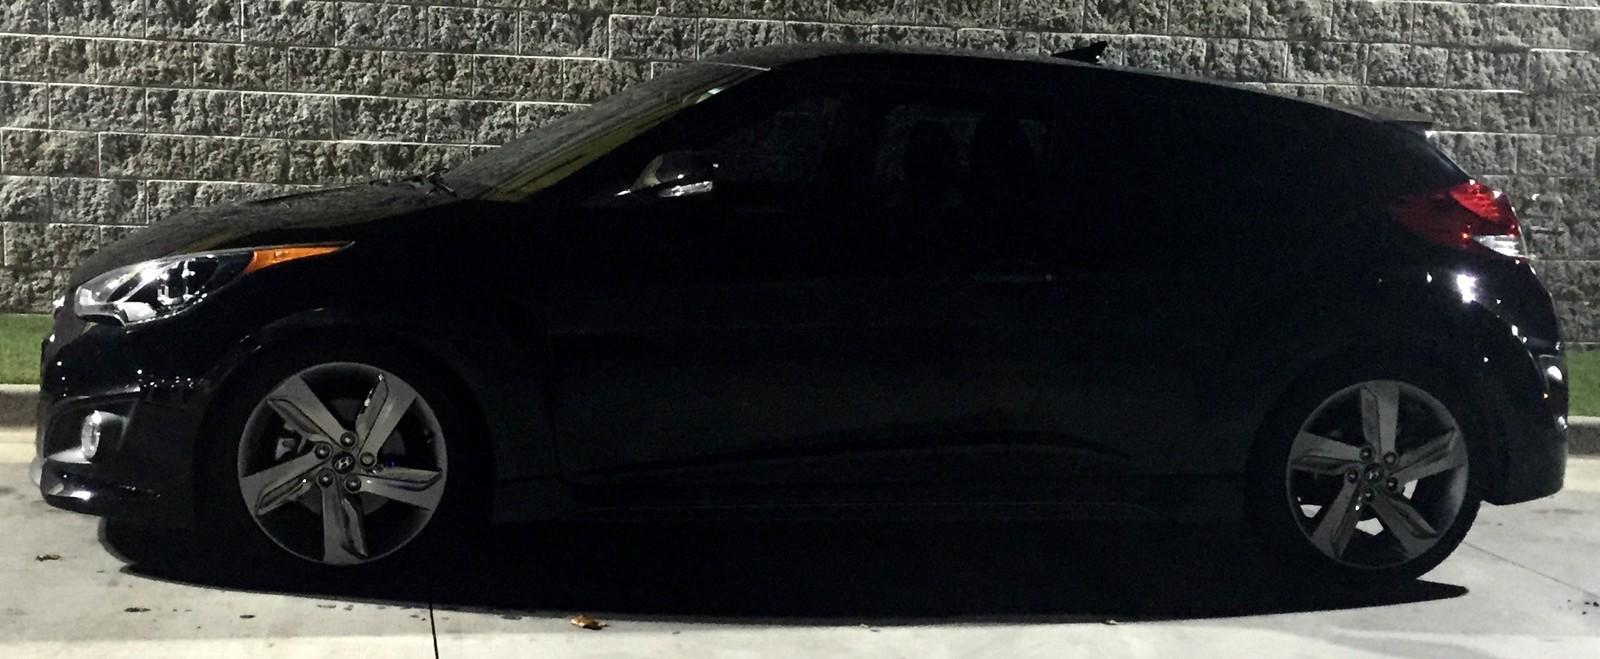 2014 Hyundai Veloster Turbo 1/4 mile Drag Racing timeslip